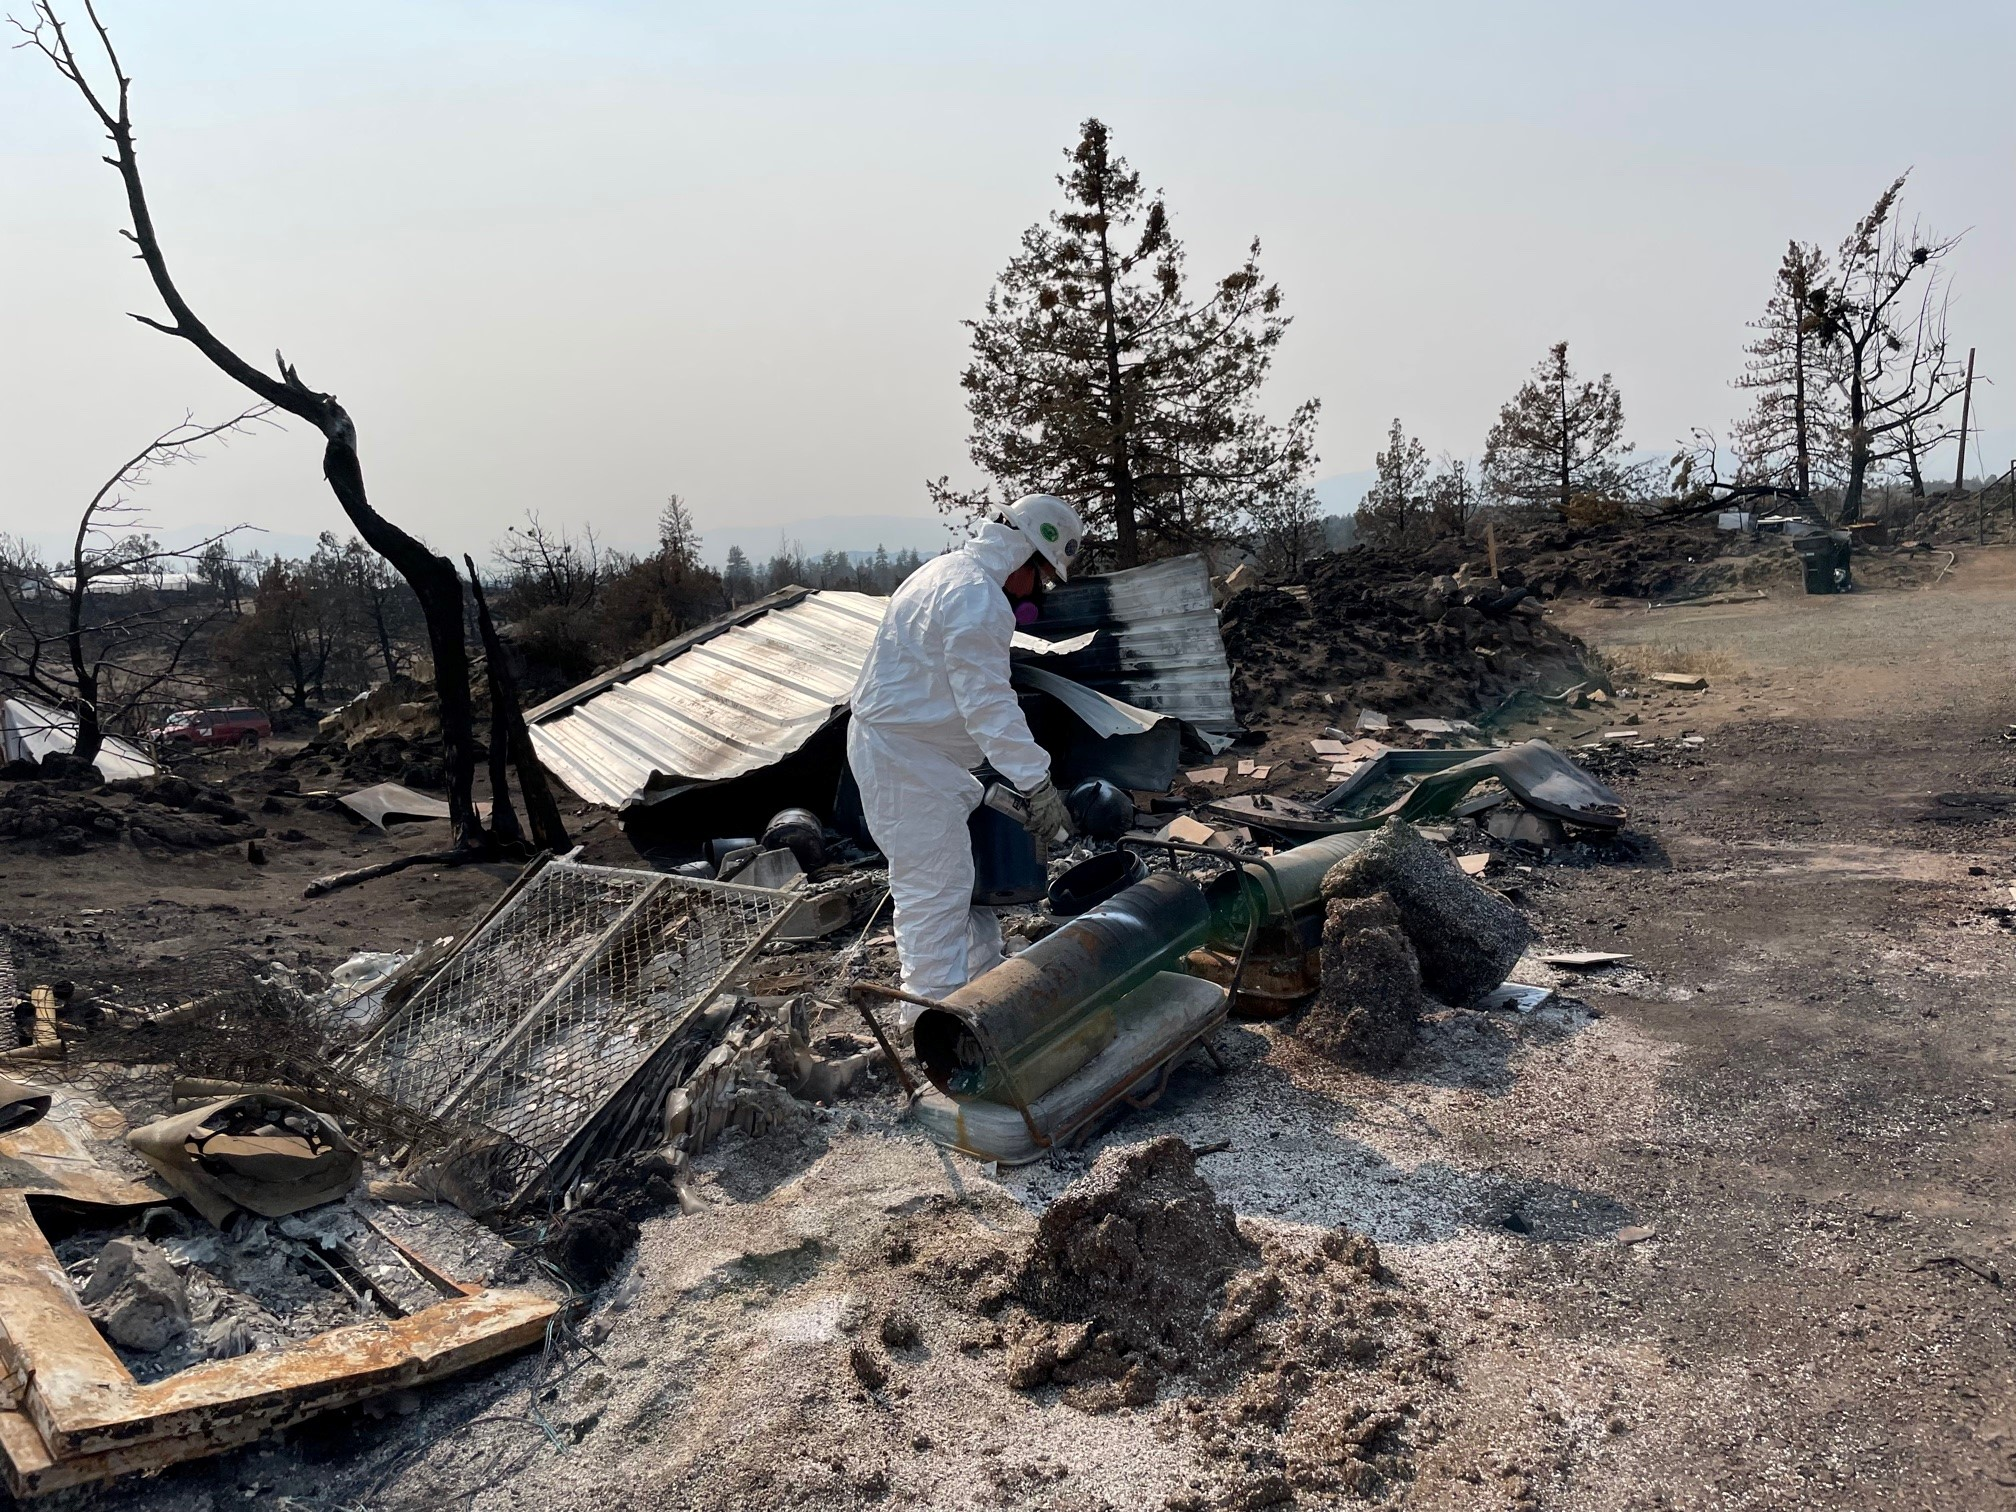 HazMat crews removing household hazardous waste